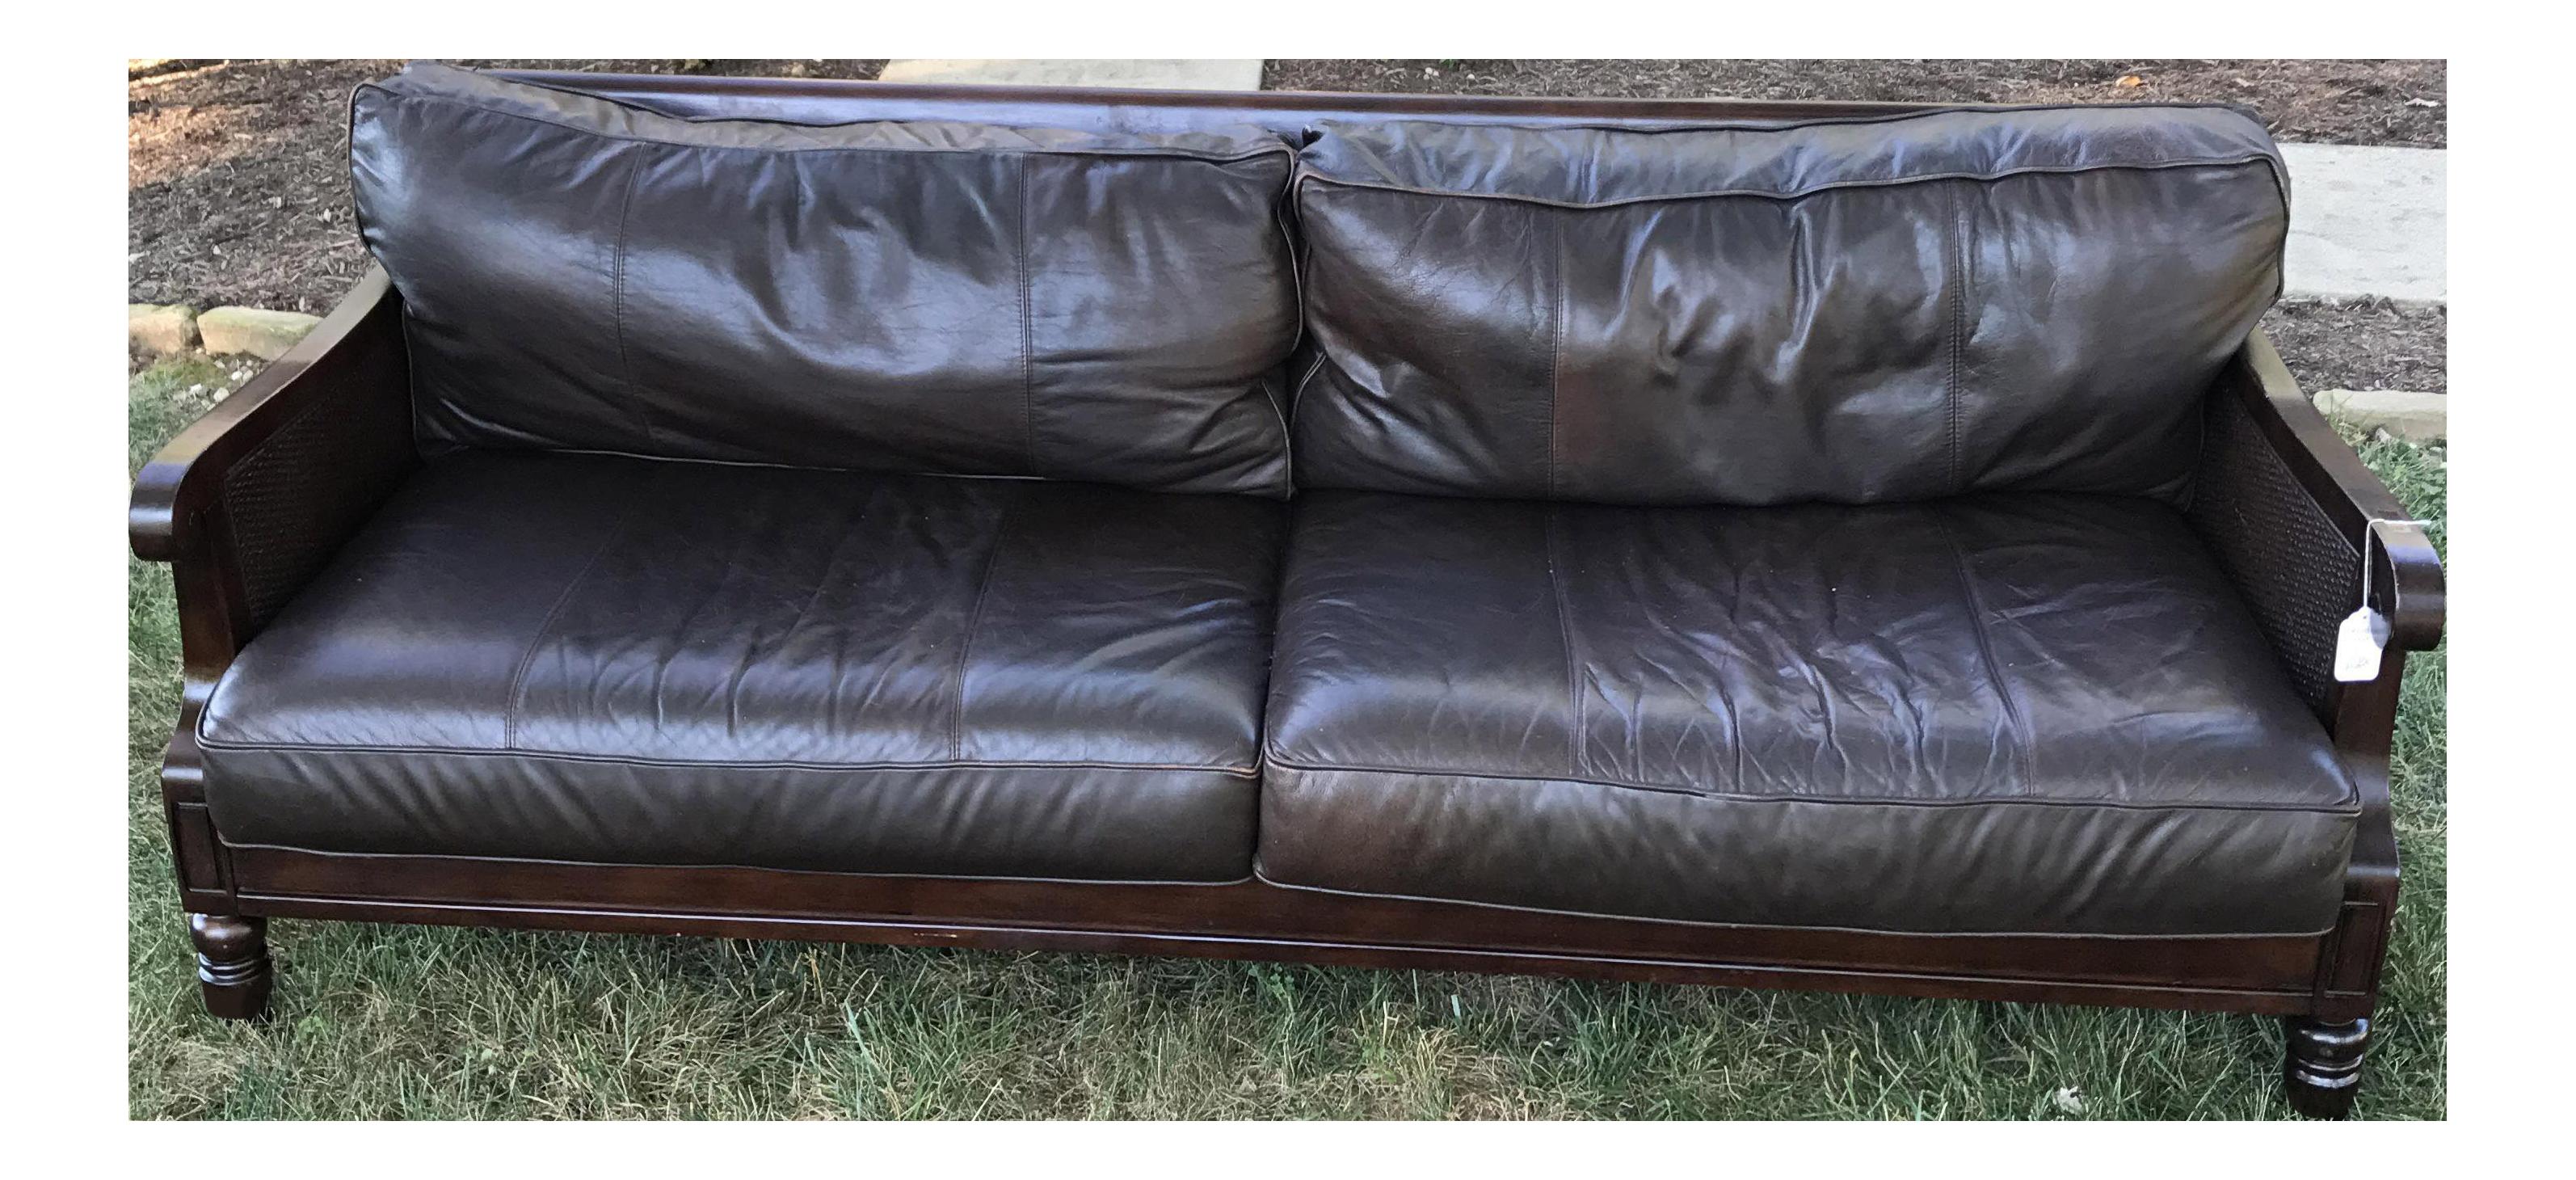 Bernhardt Leather & Cane Sofa